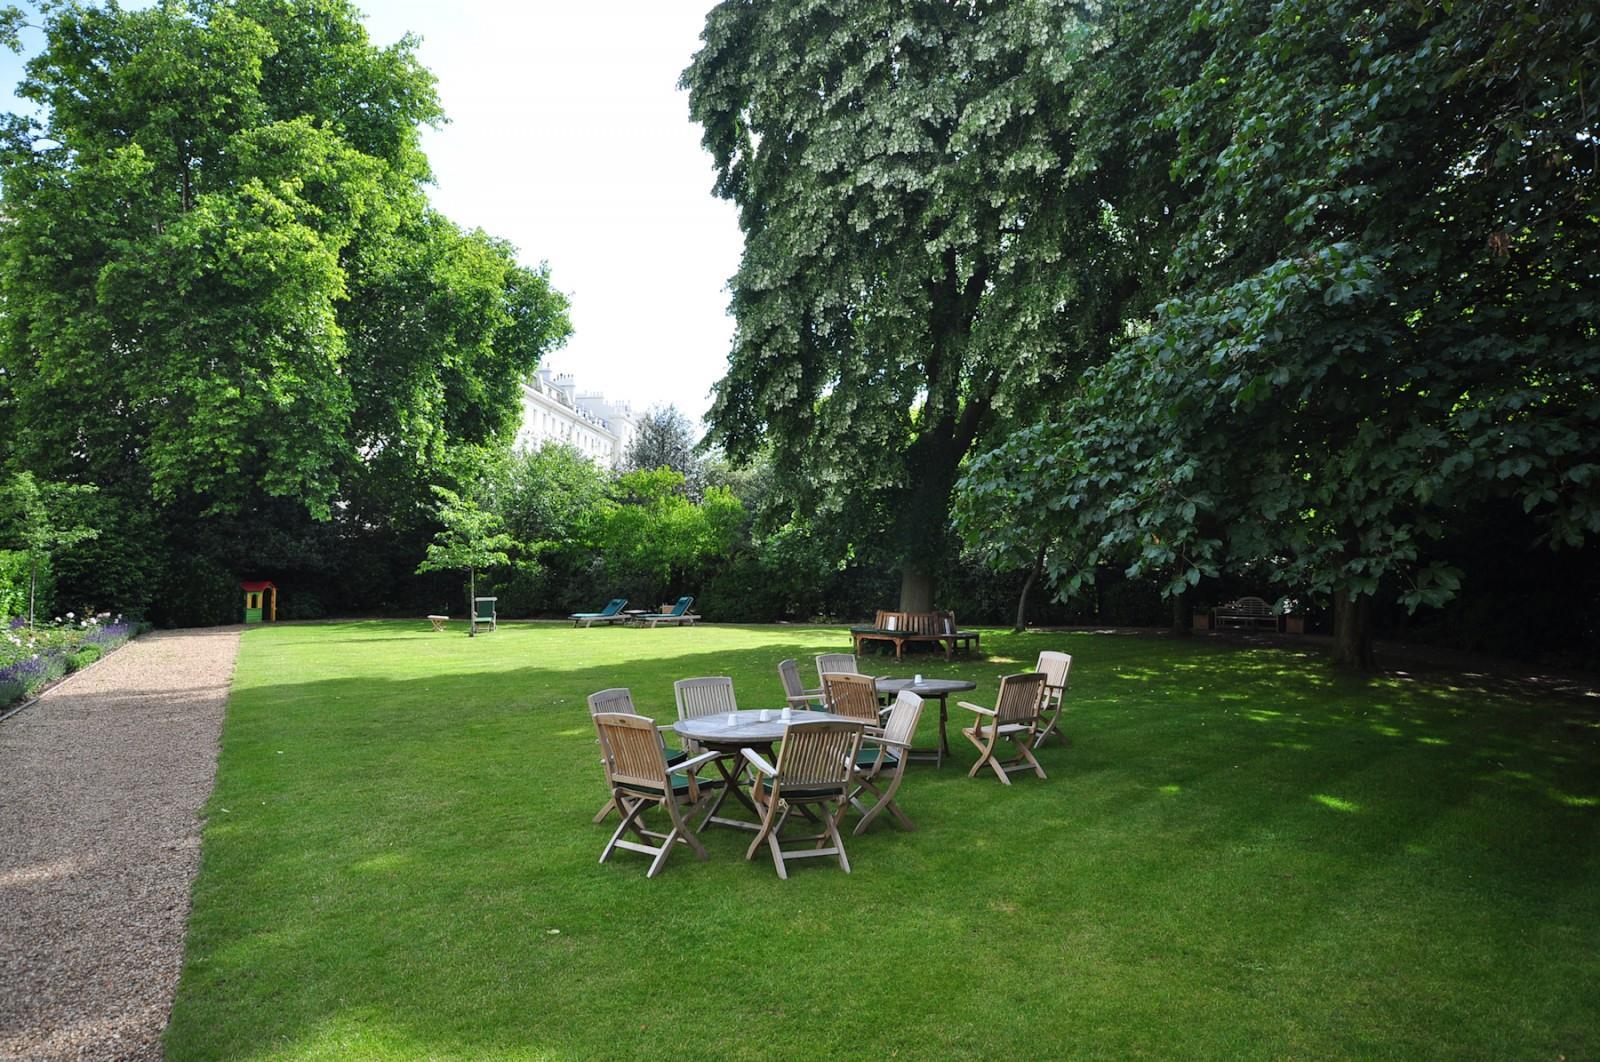 Hyde Park Gardens, Tyburnia, London W2, UK - Source: Knight Frank